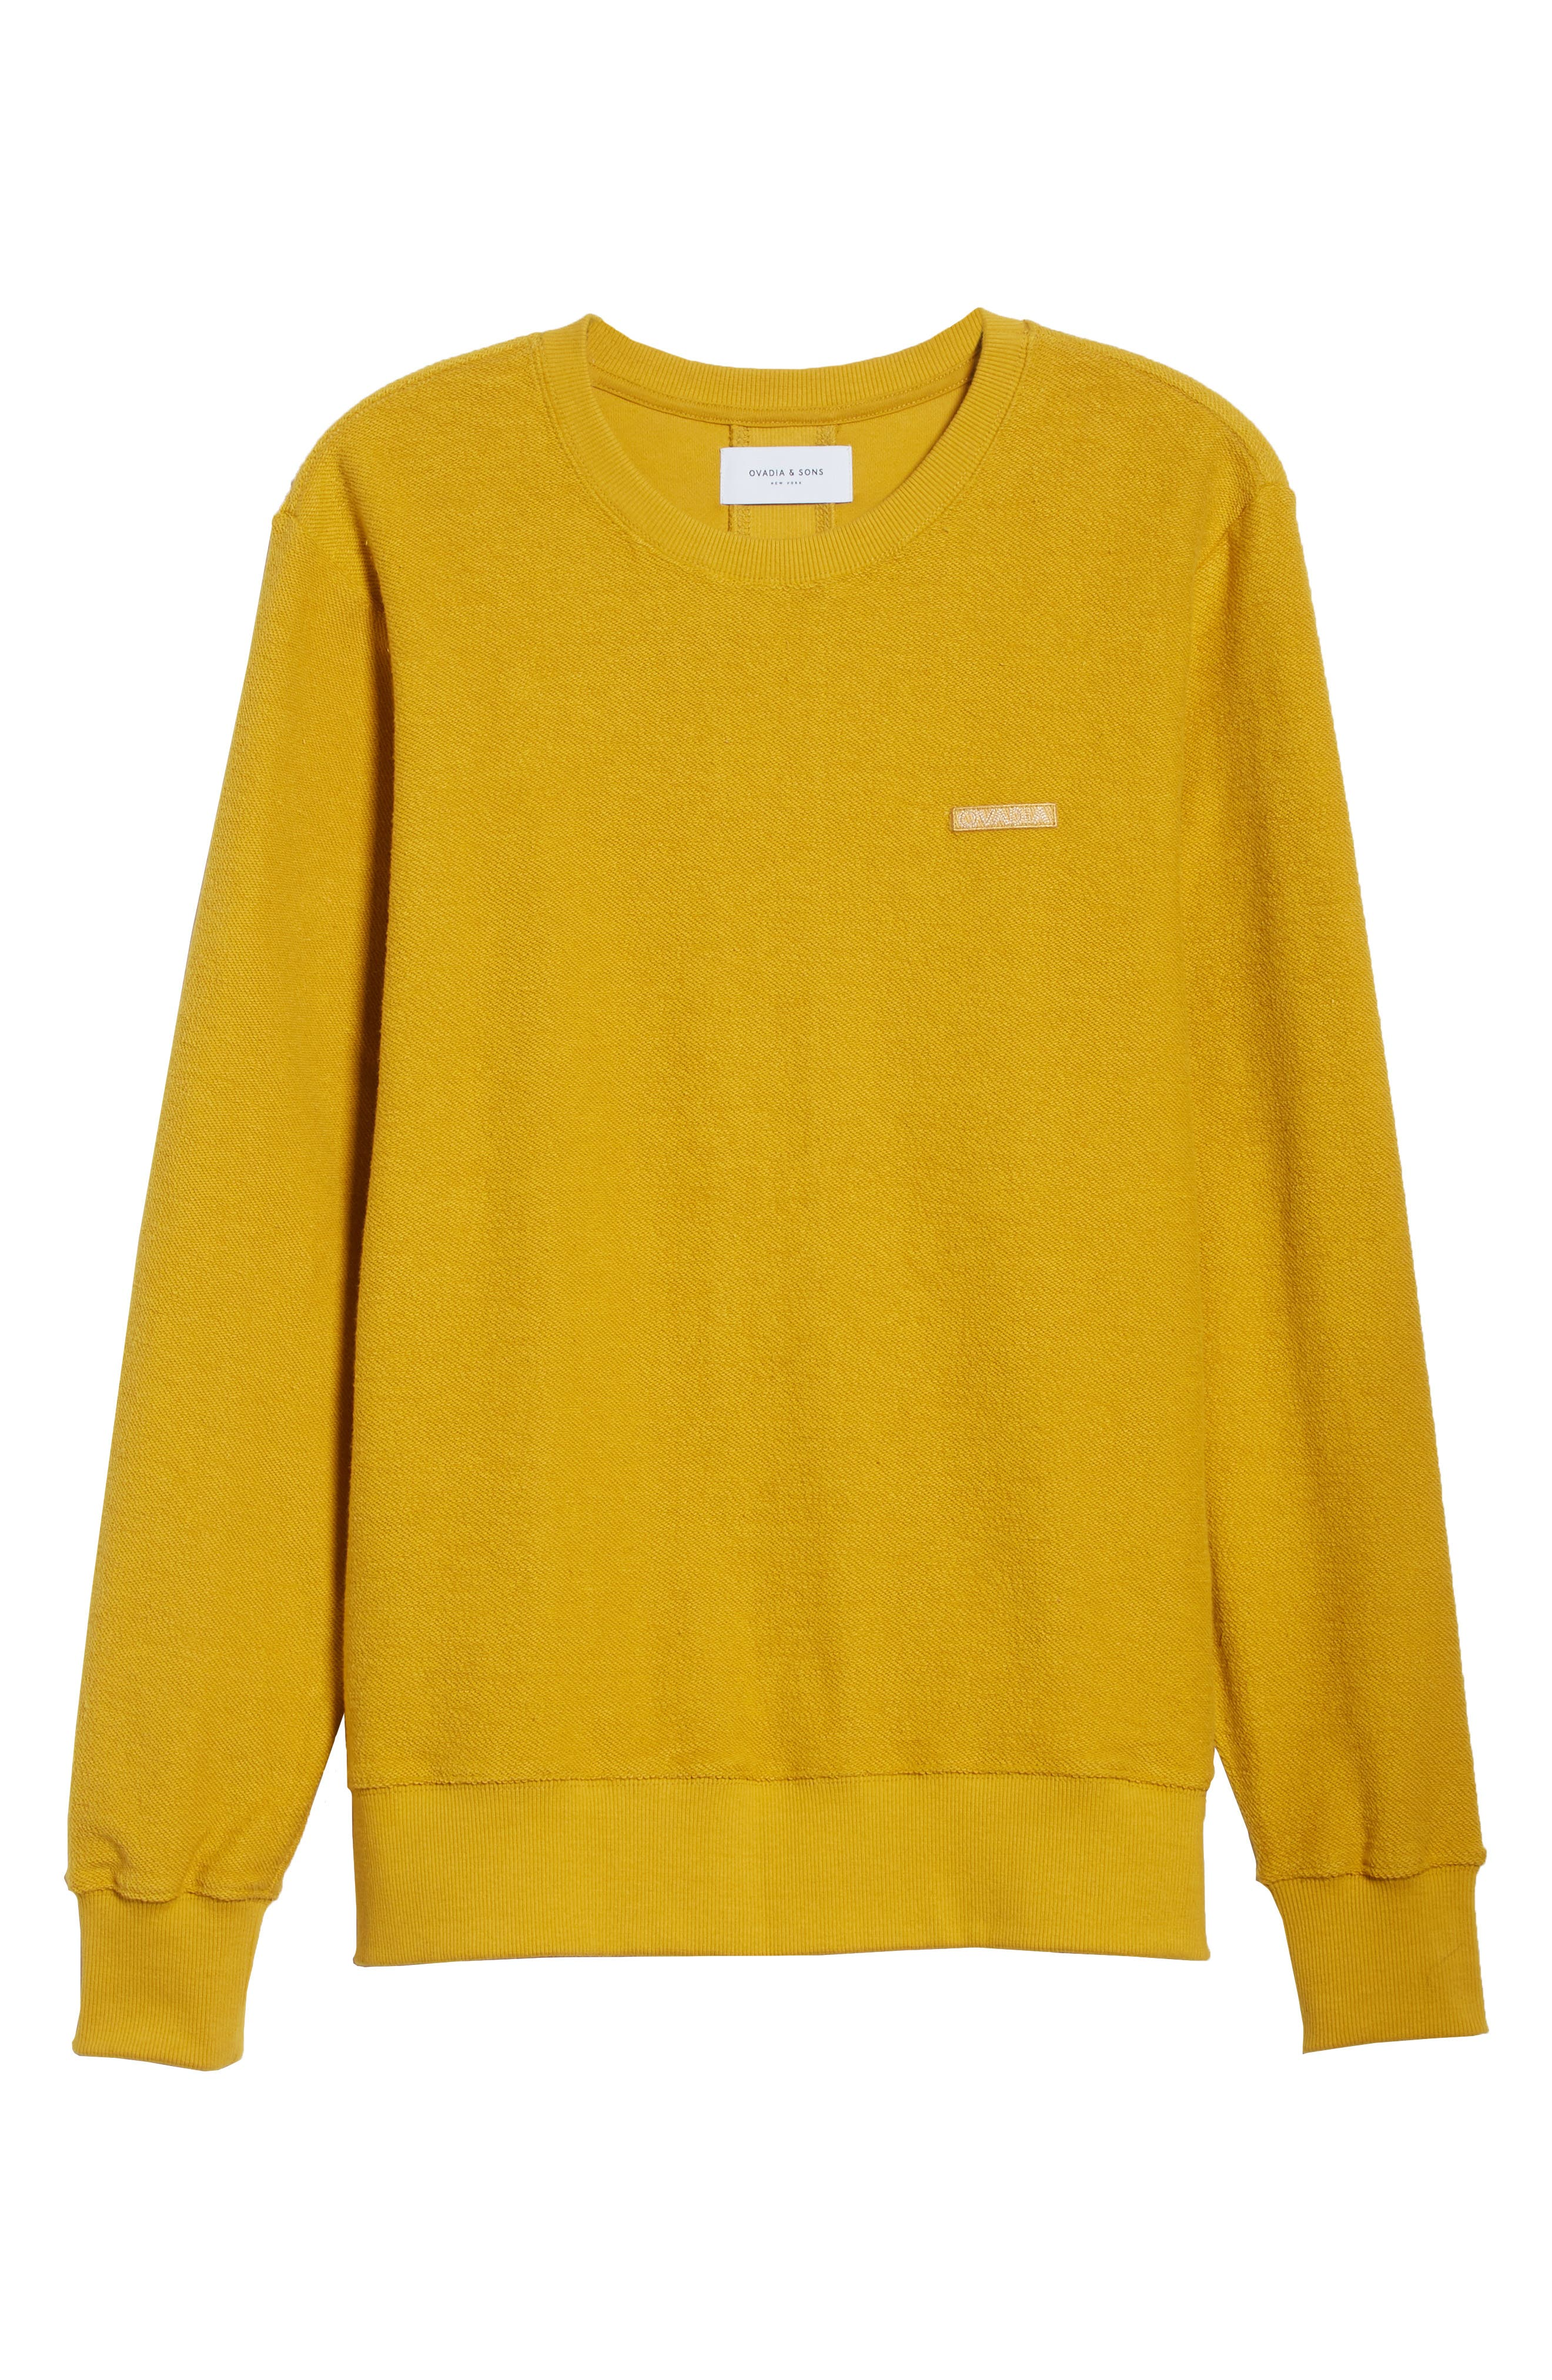 Type-01 Crewneck Sweatshirt,                             Alternate thumbnail 6, color,                             711